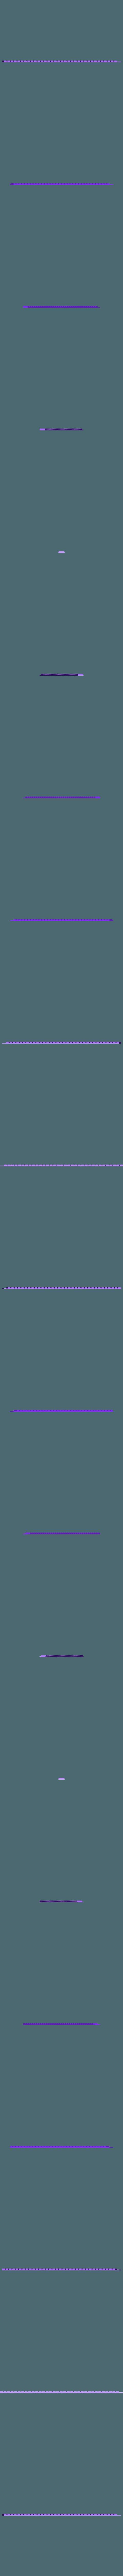 bracelet_single_color.STL Download free STL file Multi-Color Bangle (Bracelet) • 3D printer template, MosaicManufacturing